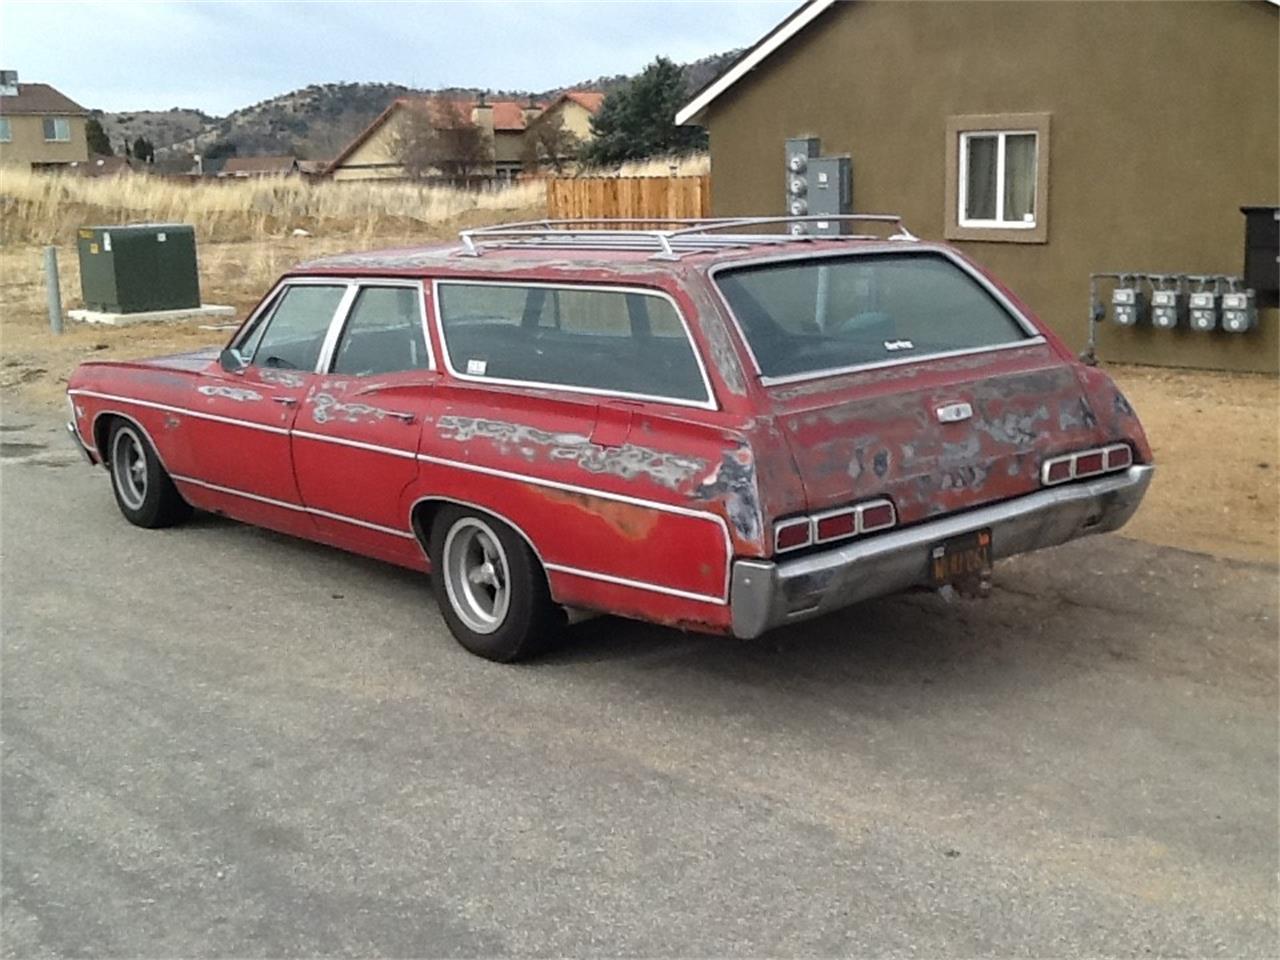 1967 Chevrolet Station Wagon (CC-1201022) for sale in Gardena, California